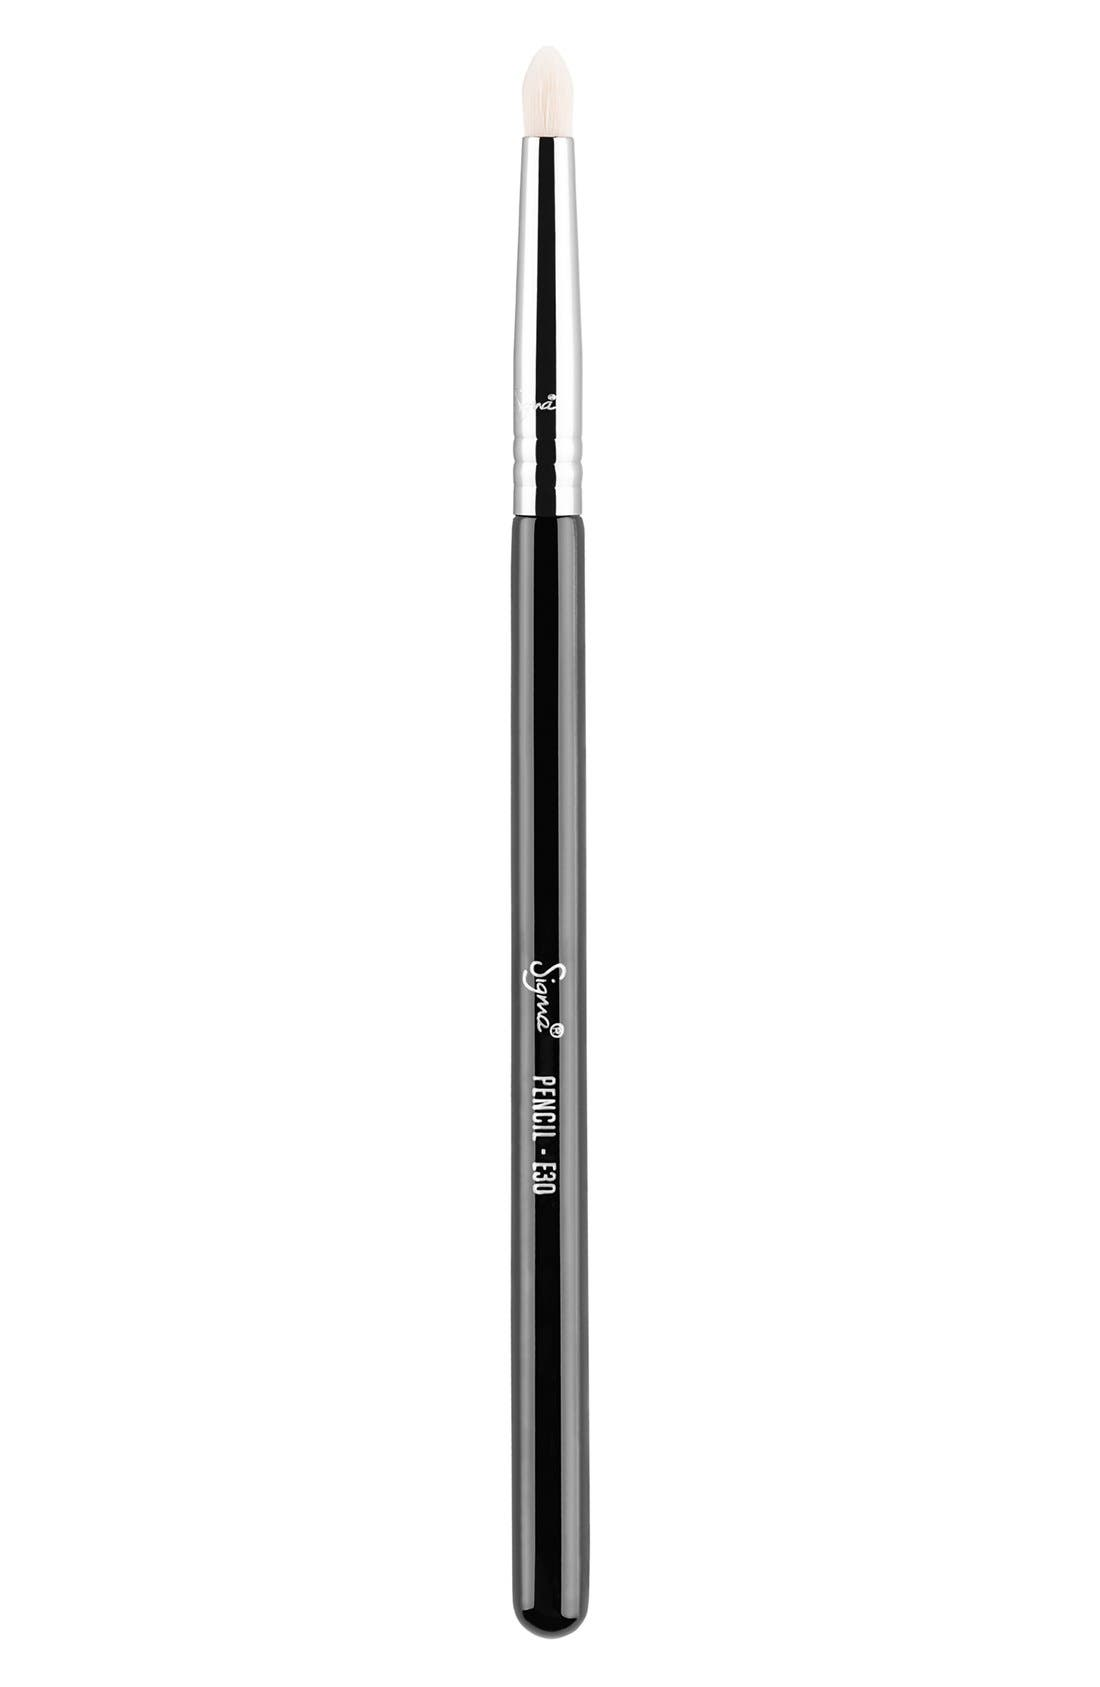 E30 Pencil Brush,                             Main thumbnail 1, color,                             NO COLOR